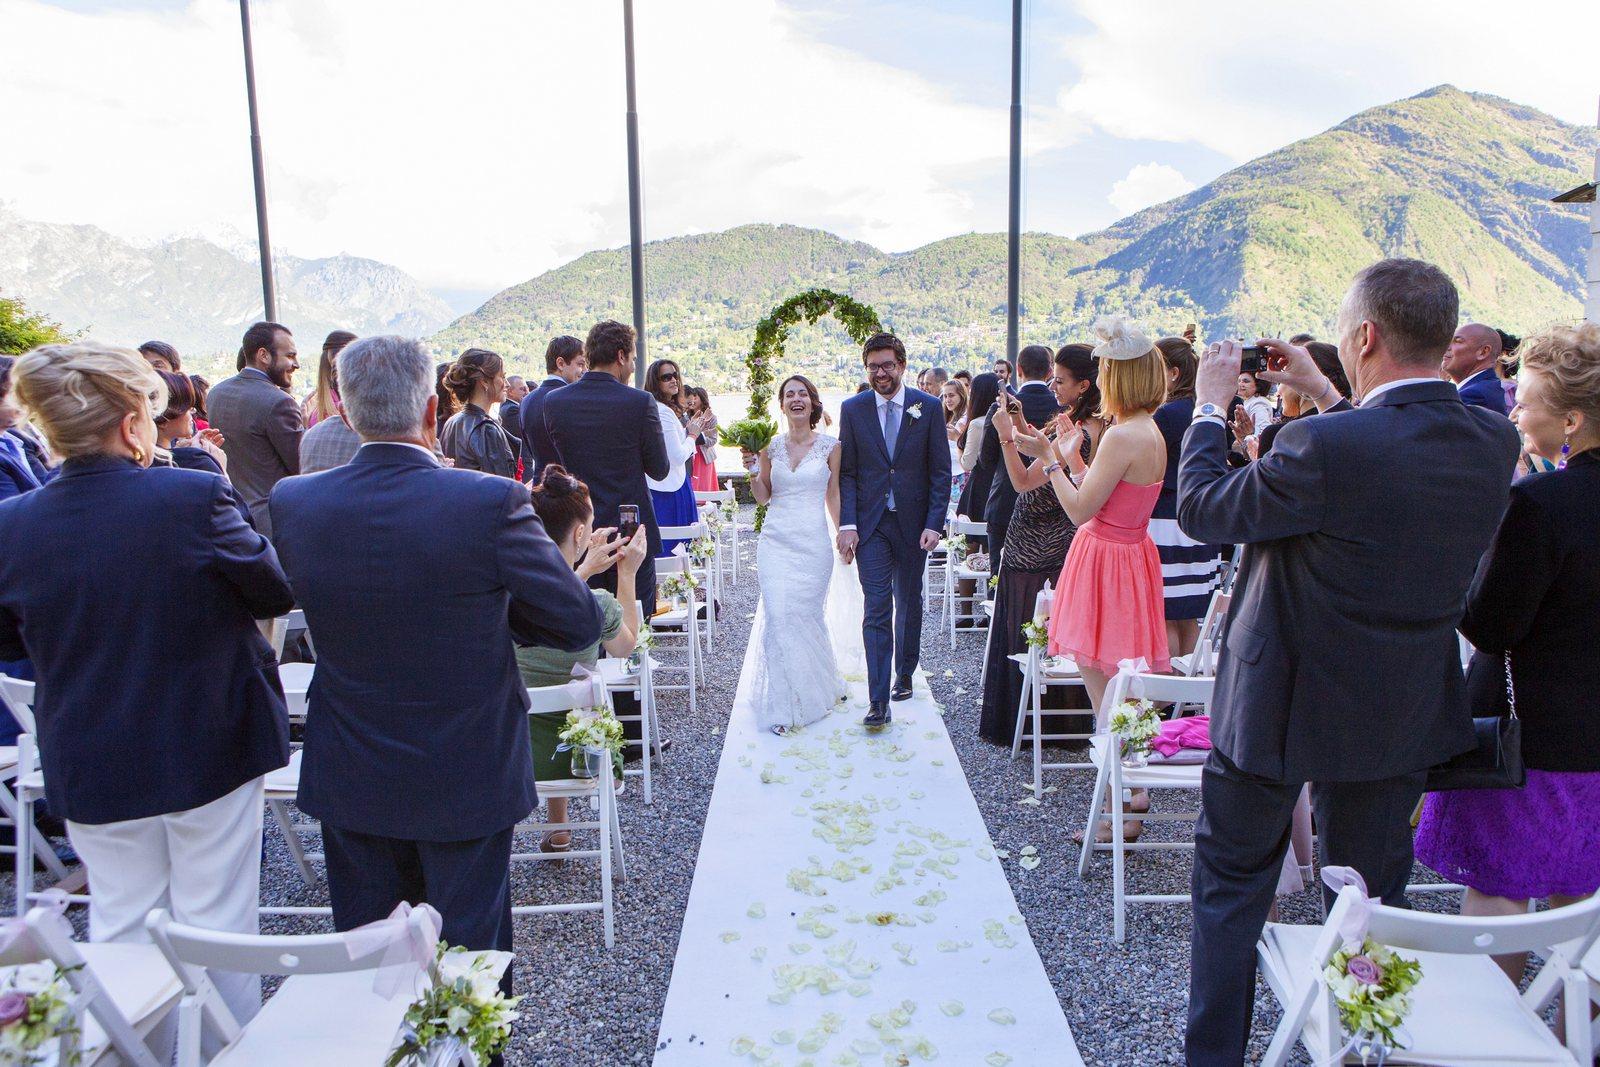 civil wedding in villa carlotta on lake como